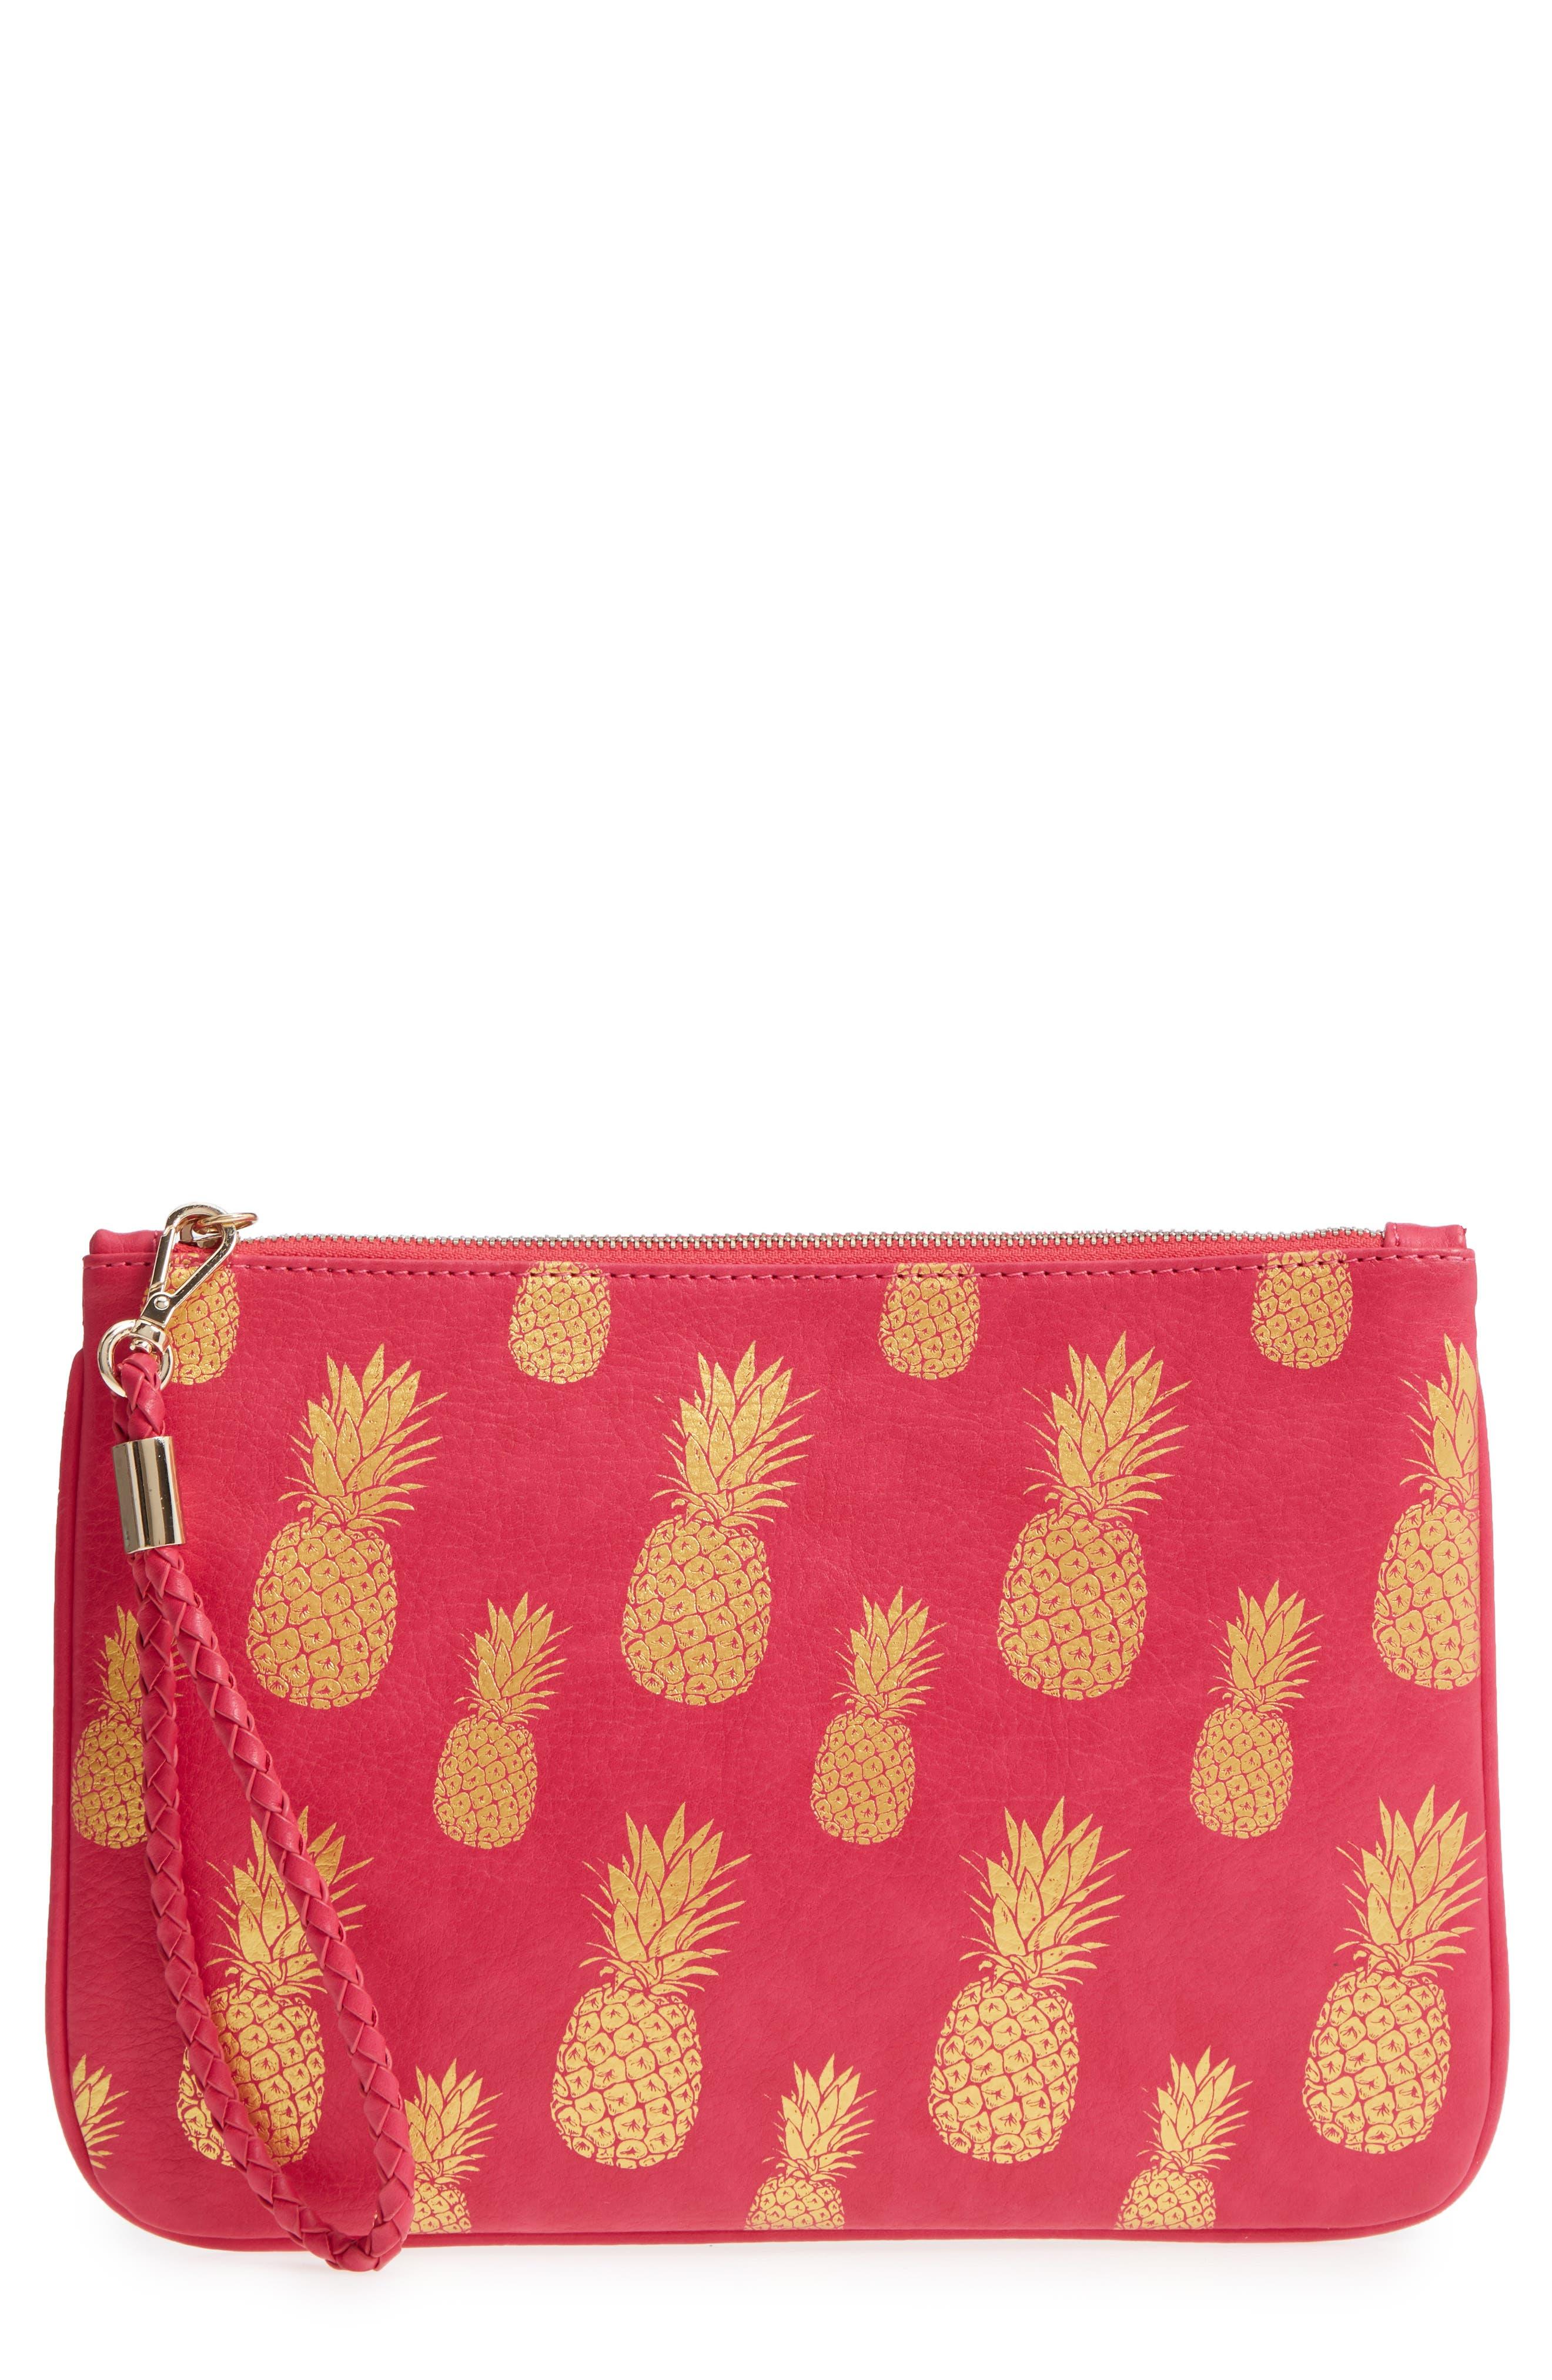 Mali + Lili Alice Pineapple Print Vegan Leather Clutch